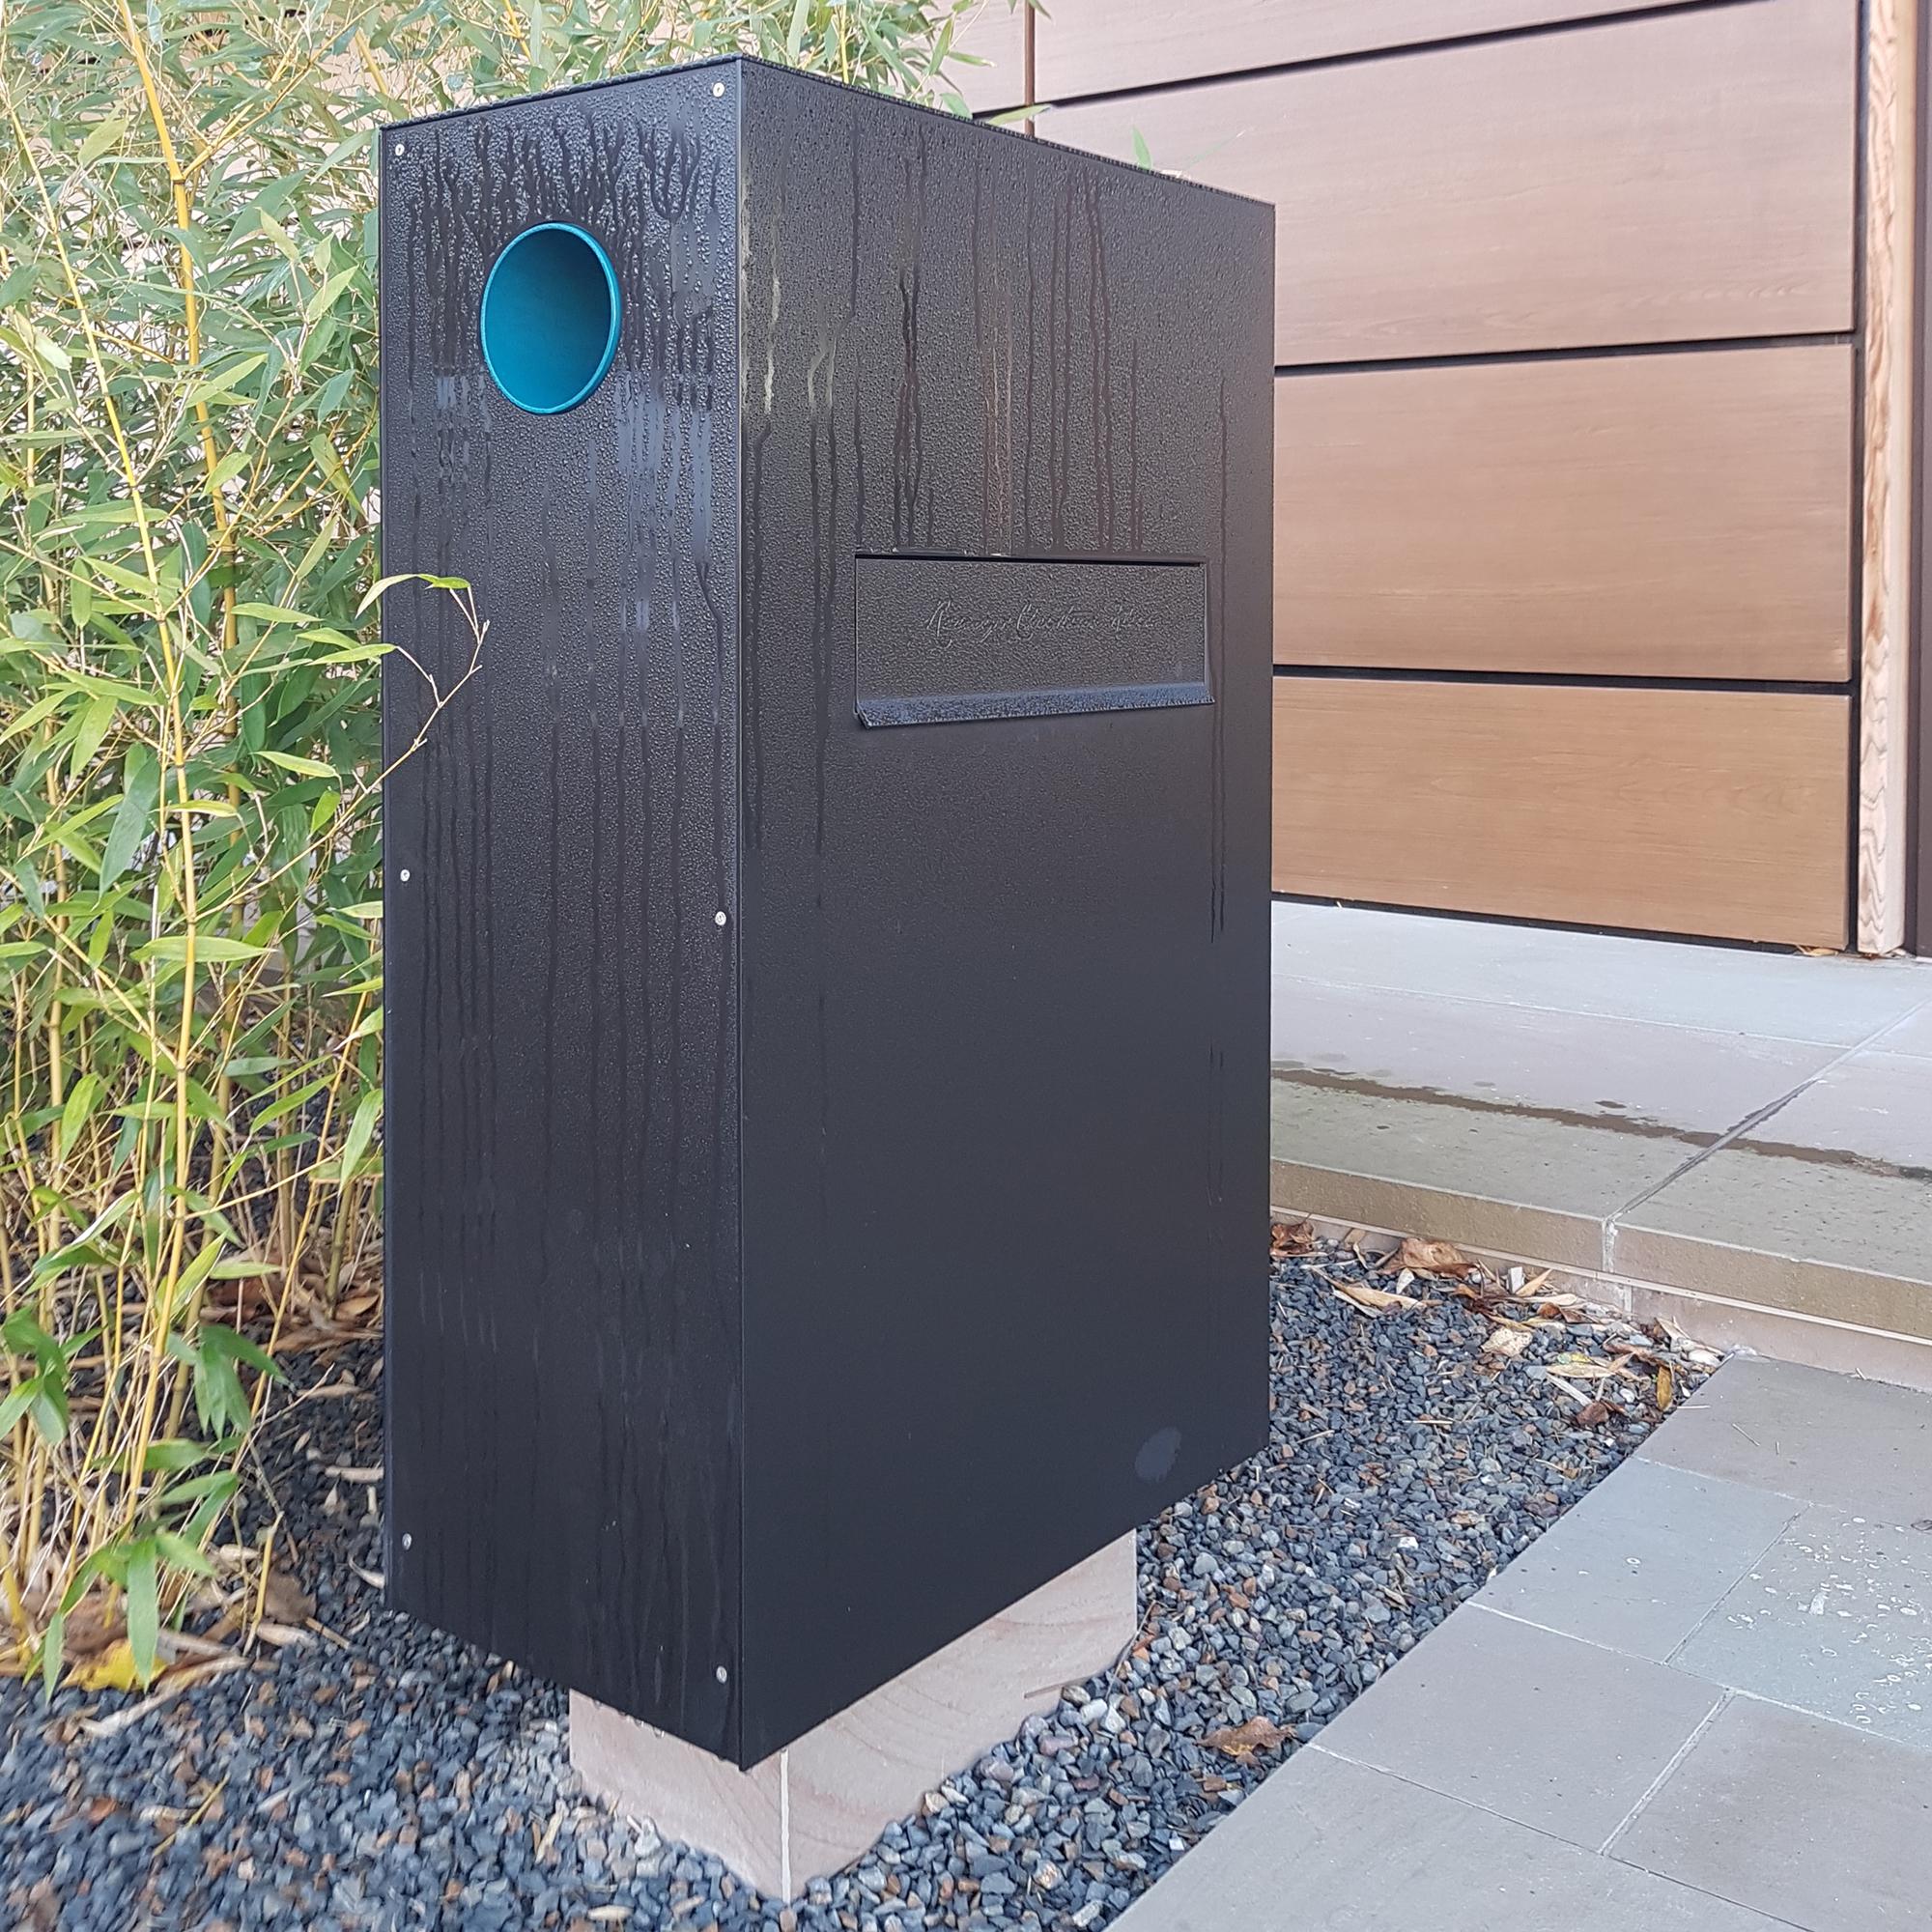 Briefkasten Stele | Aluminium eloxiert C34